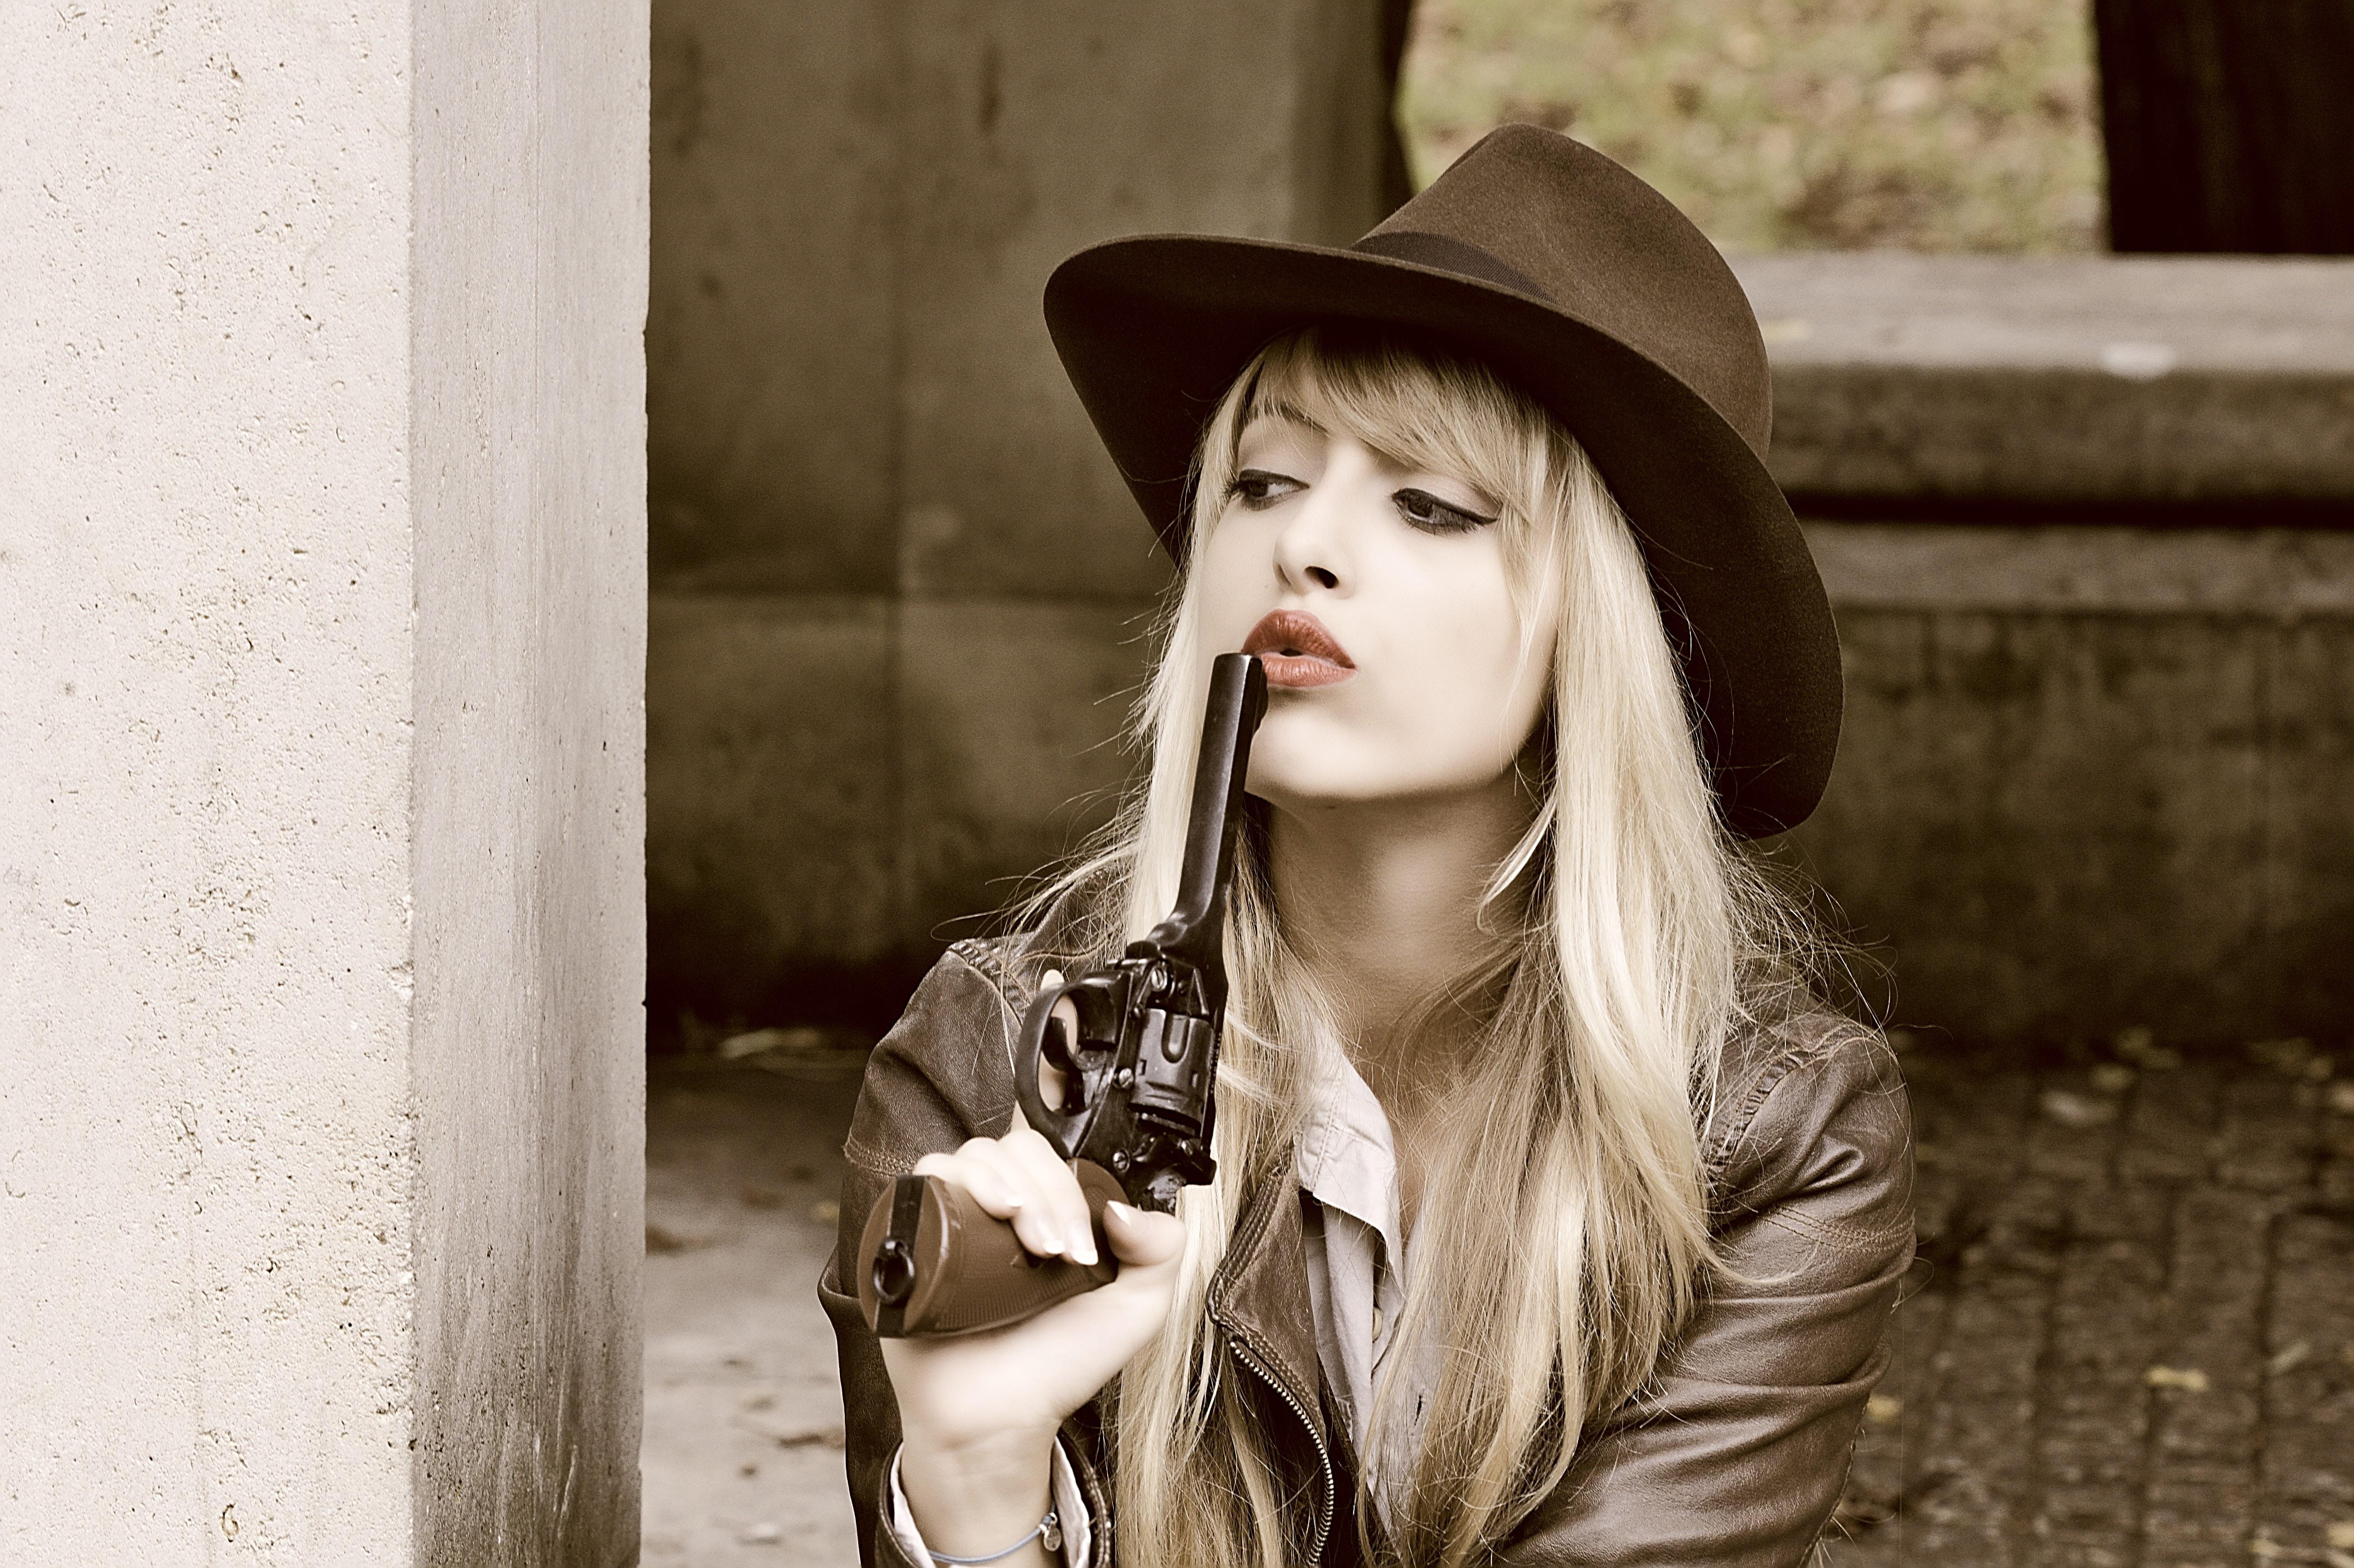 woman holding revolver